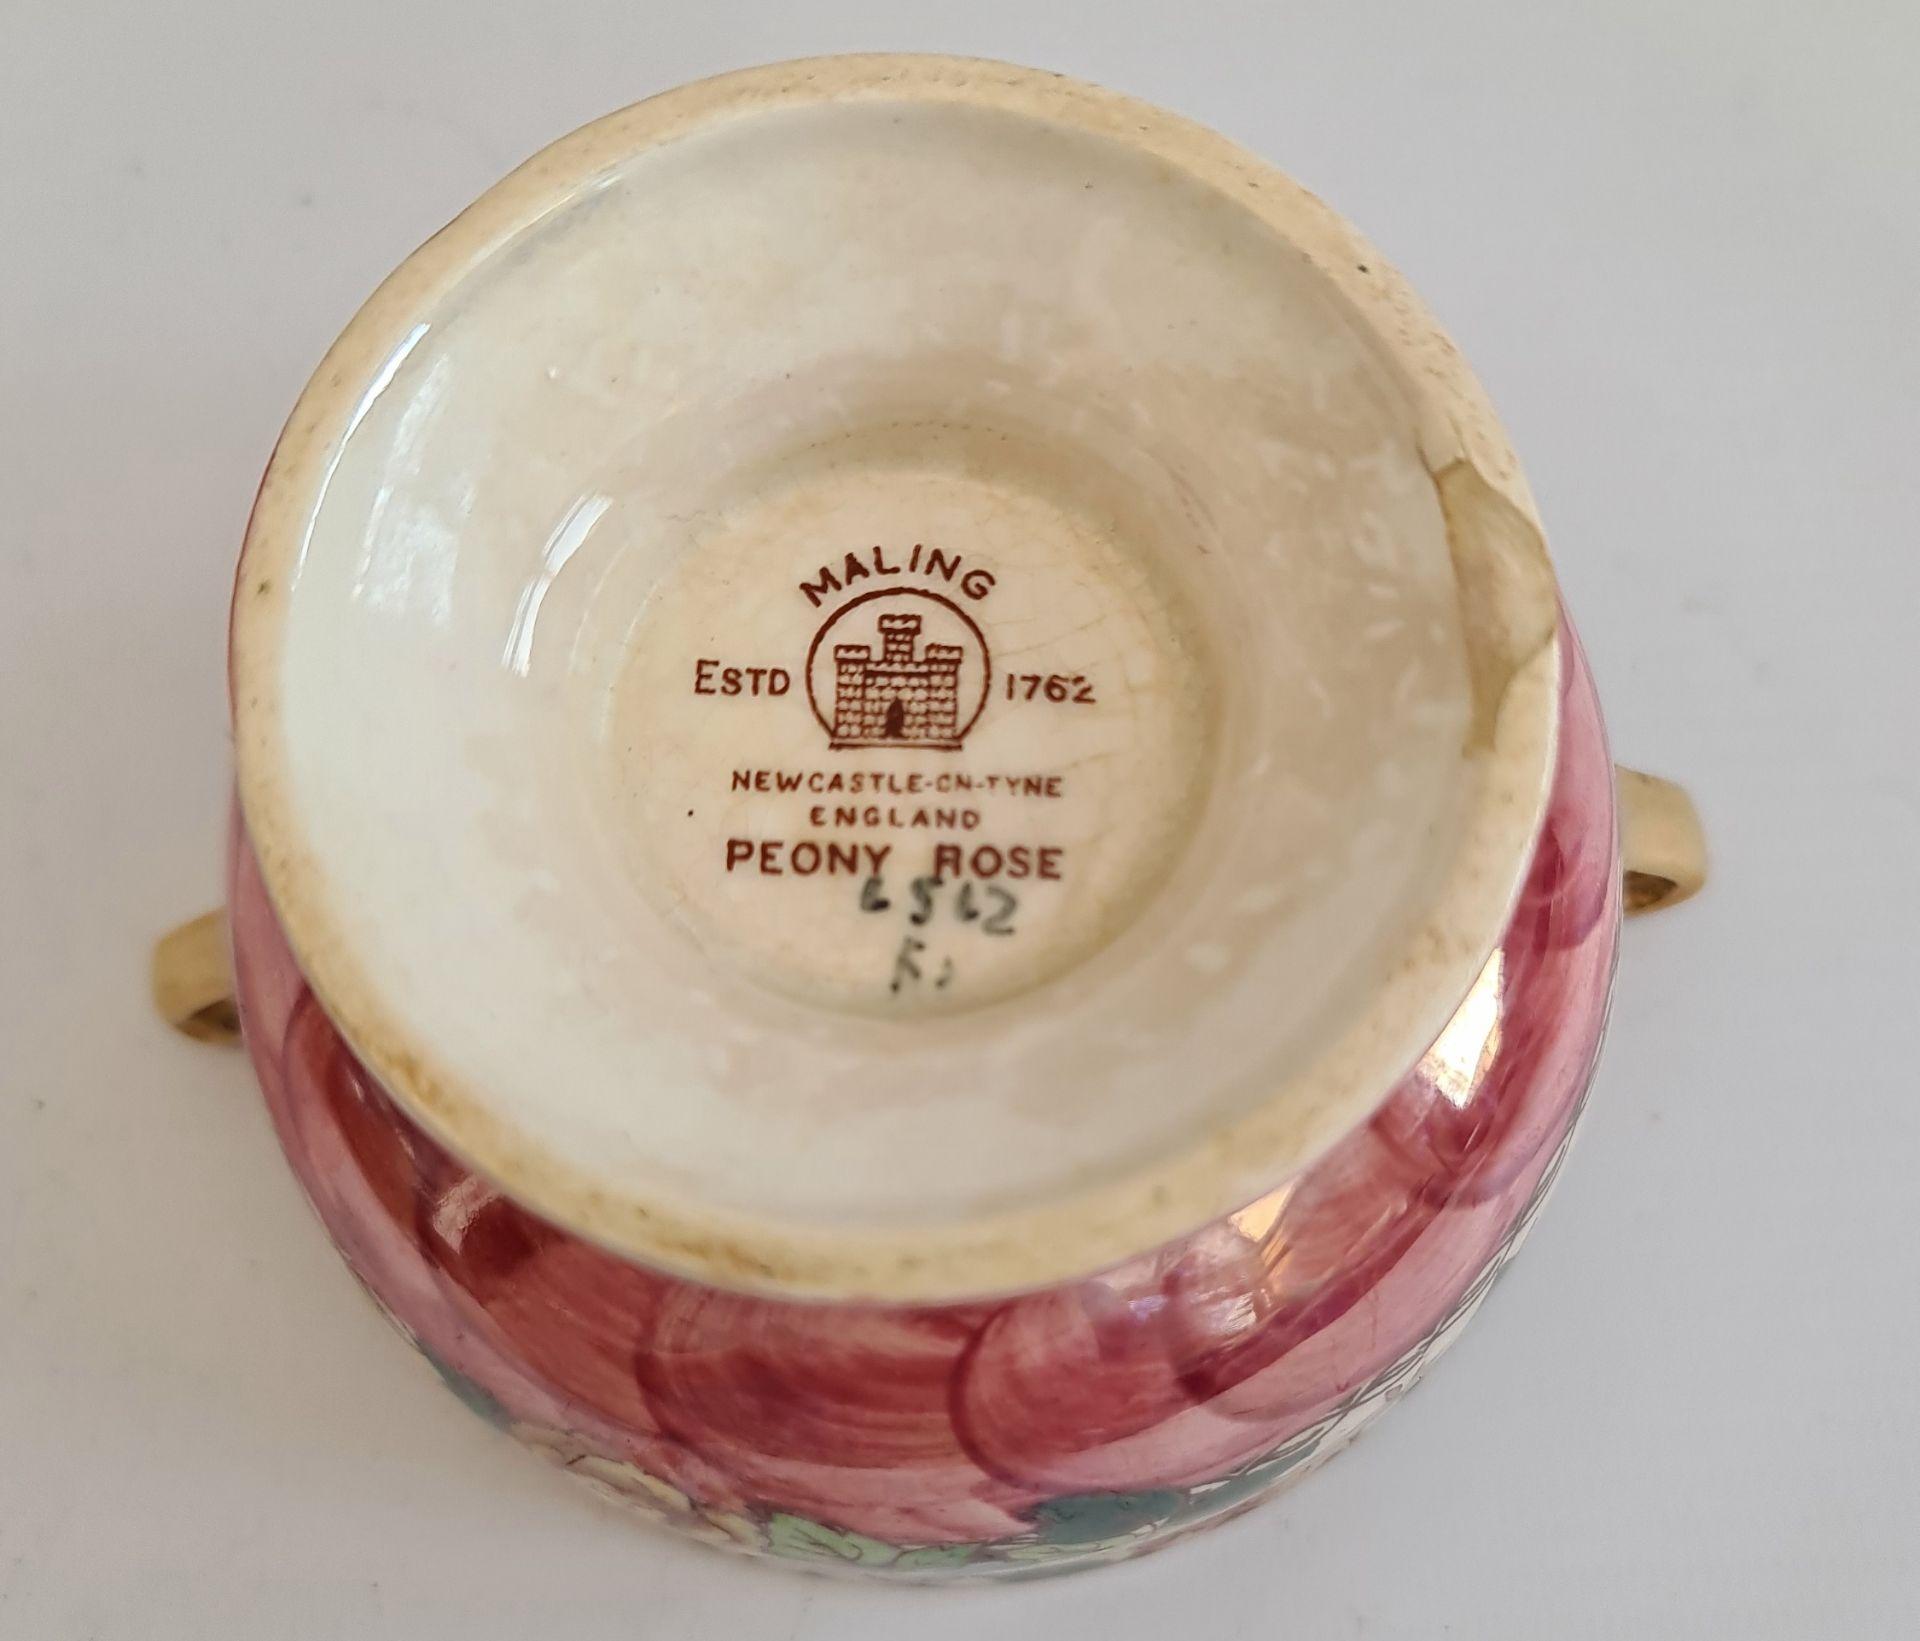 Antique Bretby Vine leaf Pottery Mailing & Minton - Image 4 of 5